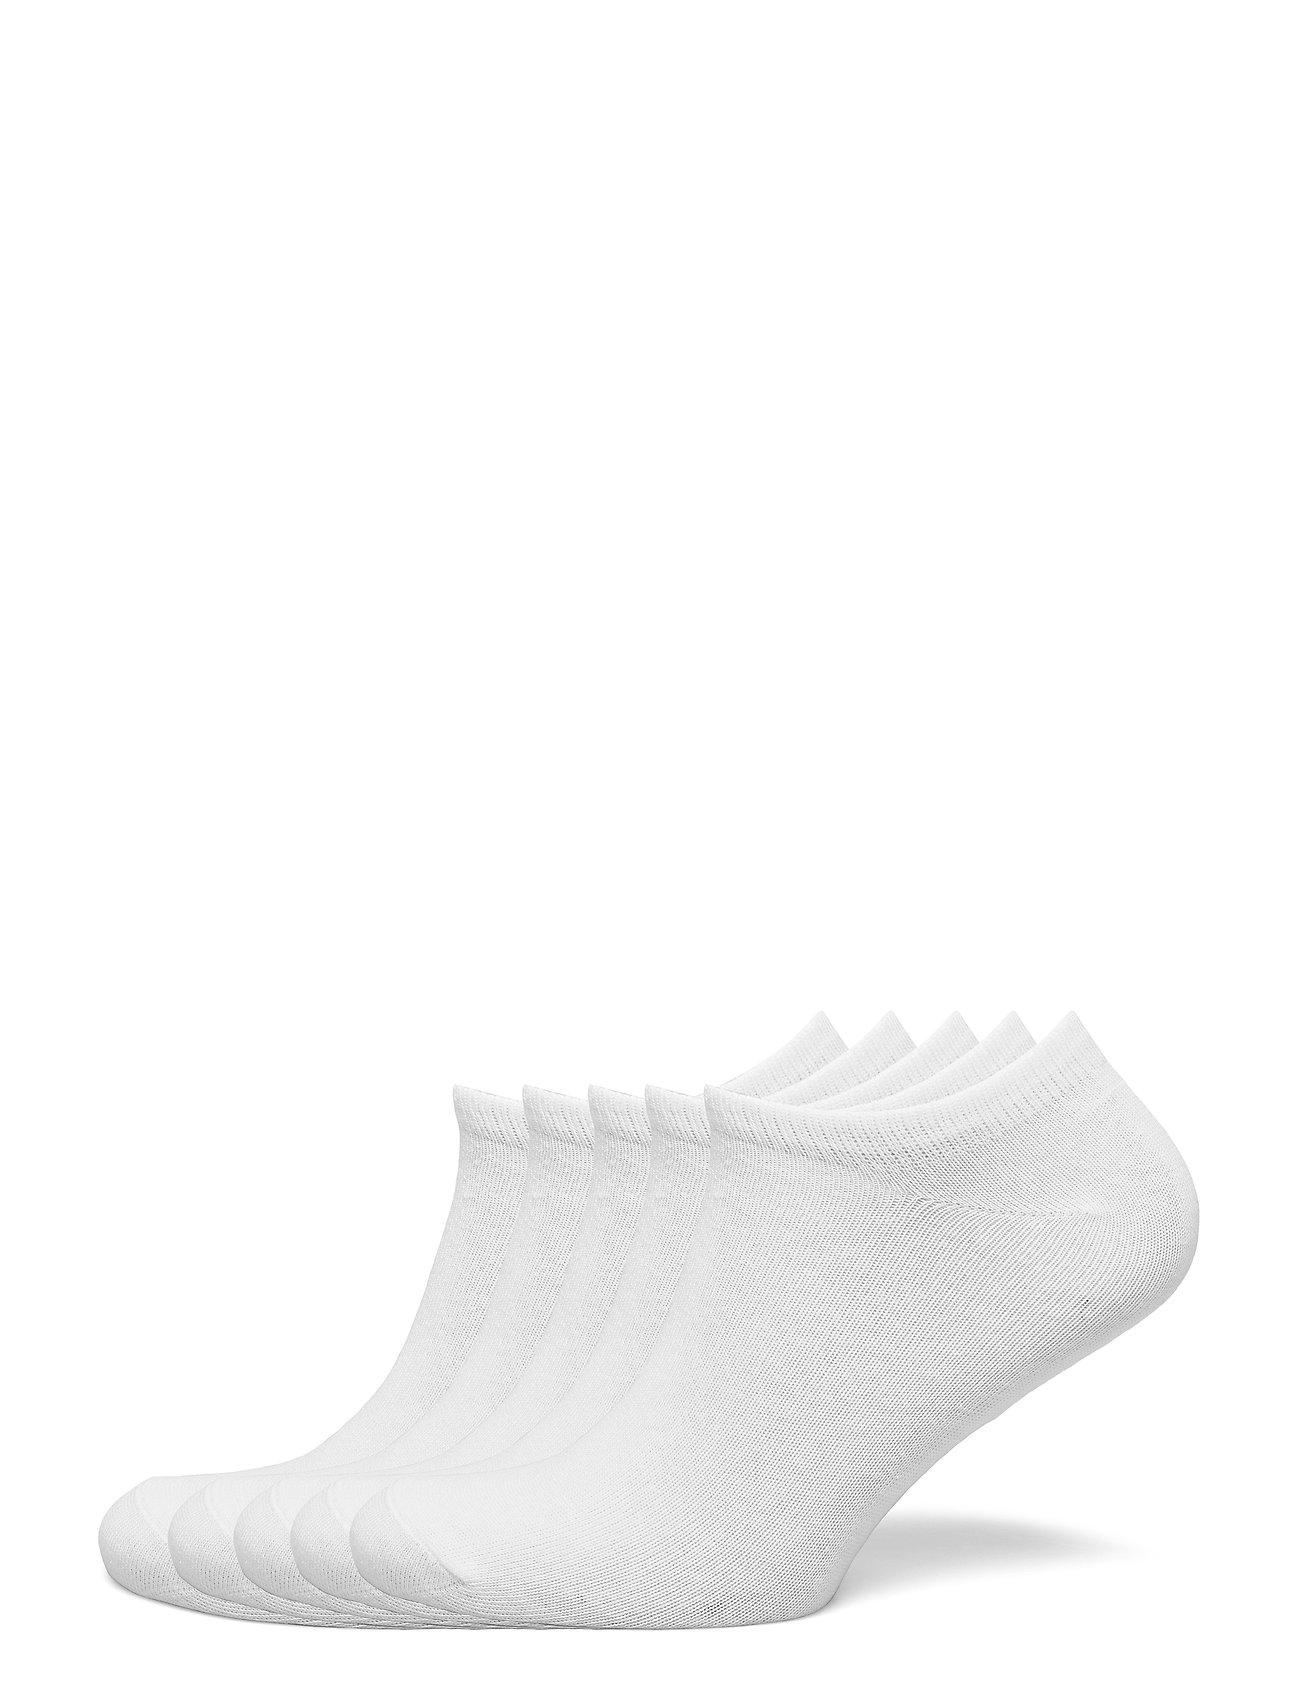 Boozt Merchandise Odense 5-pack sock - WHITE